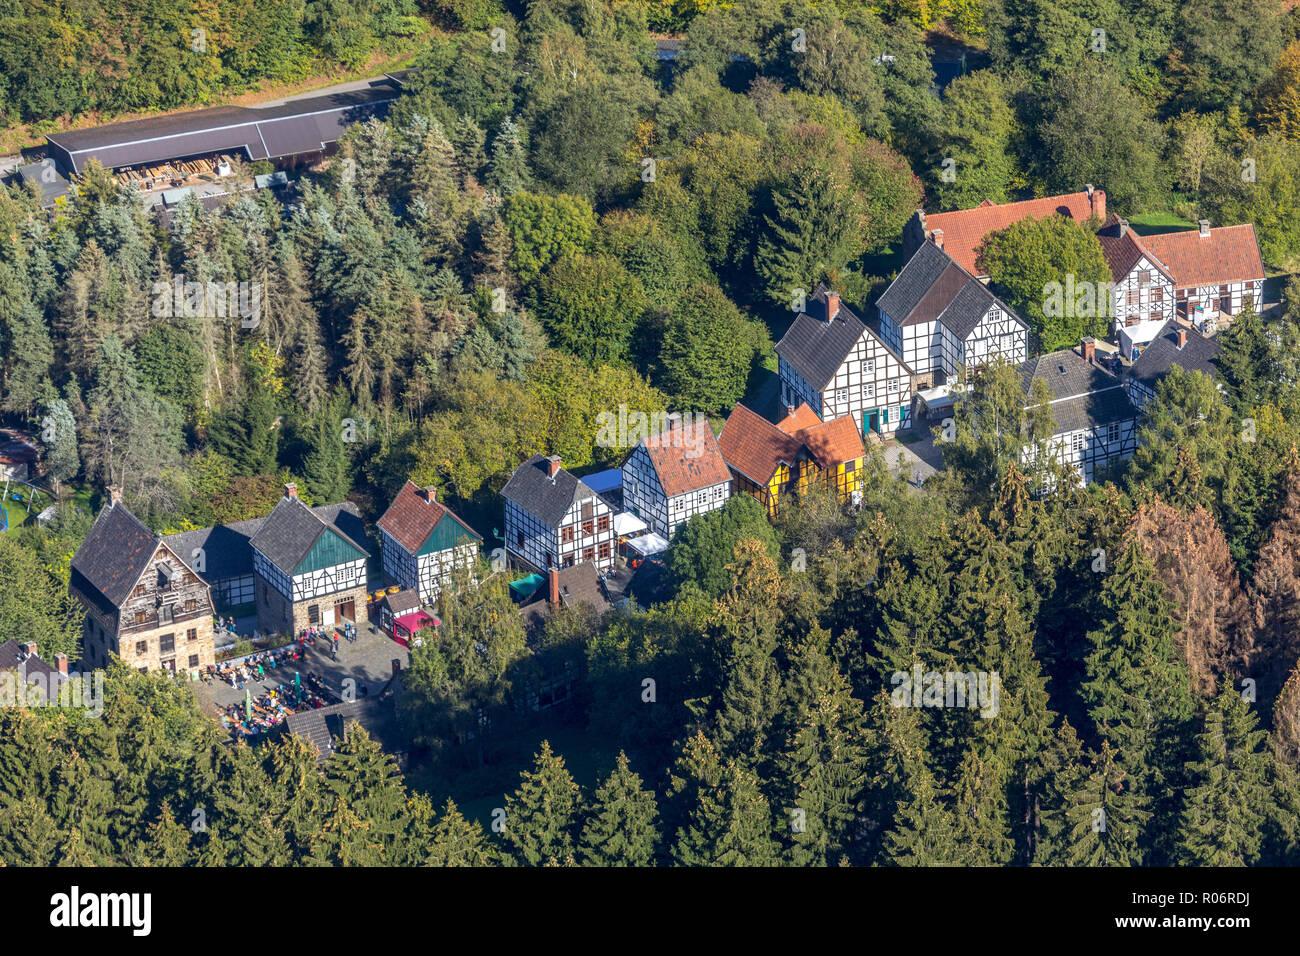 Aerial view, German blacksmith museum, zinc rolling mill, half timbered houses, Mäckingerbach Schmalsgotte, Hagen, Ruhr area, North Rhine-Westphalia,  Stock Photo